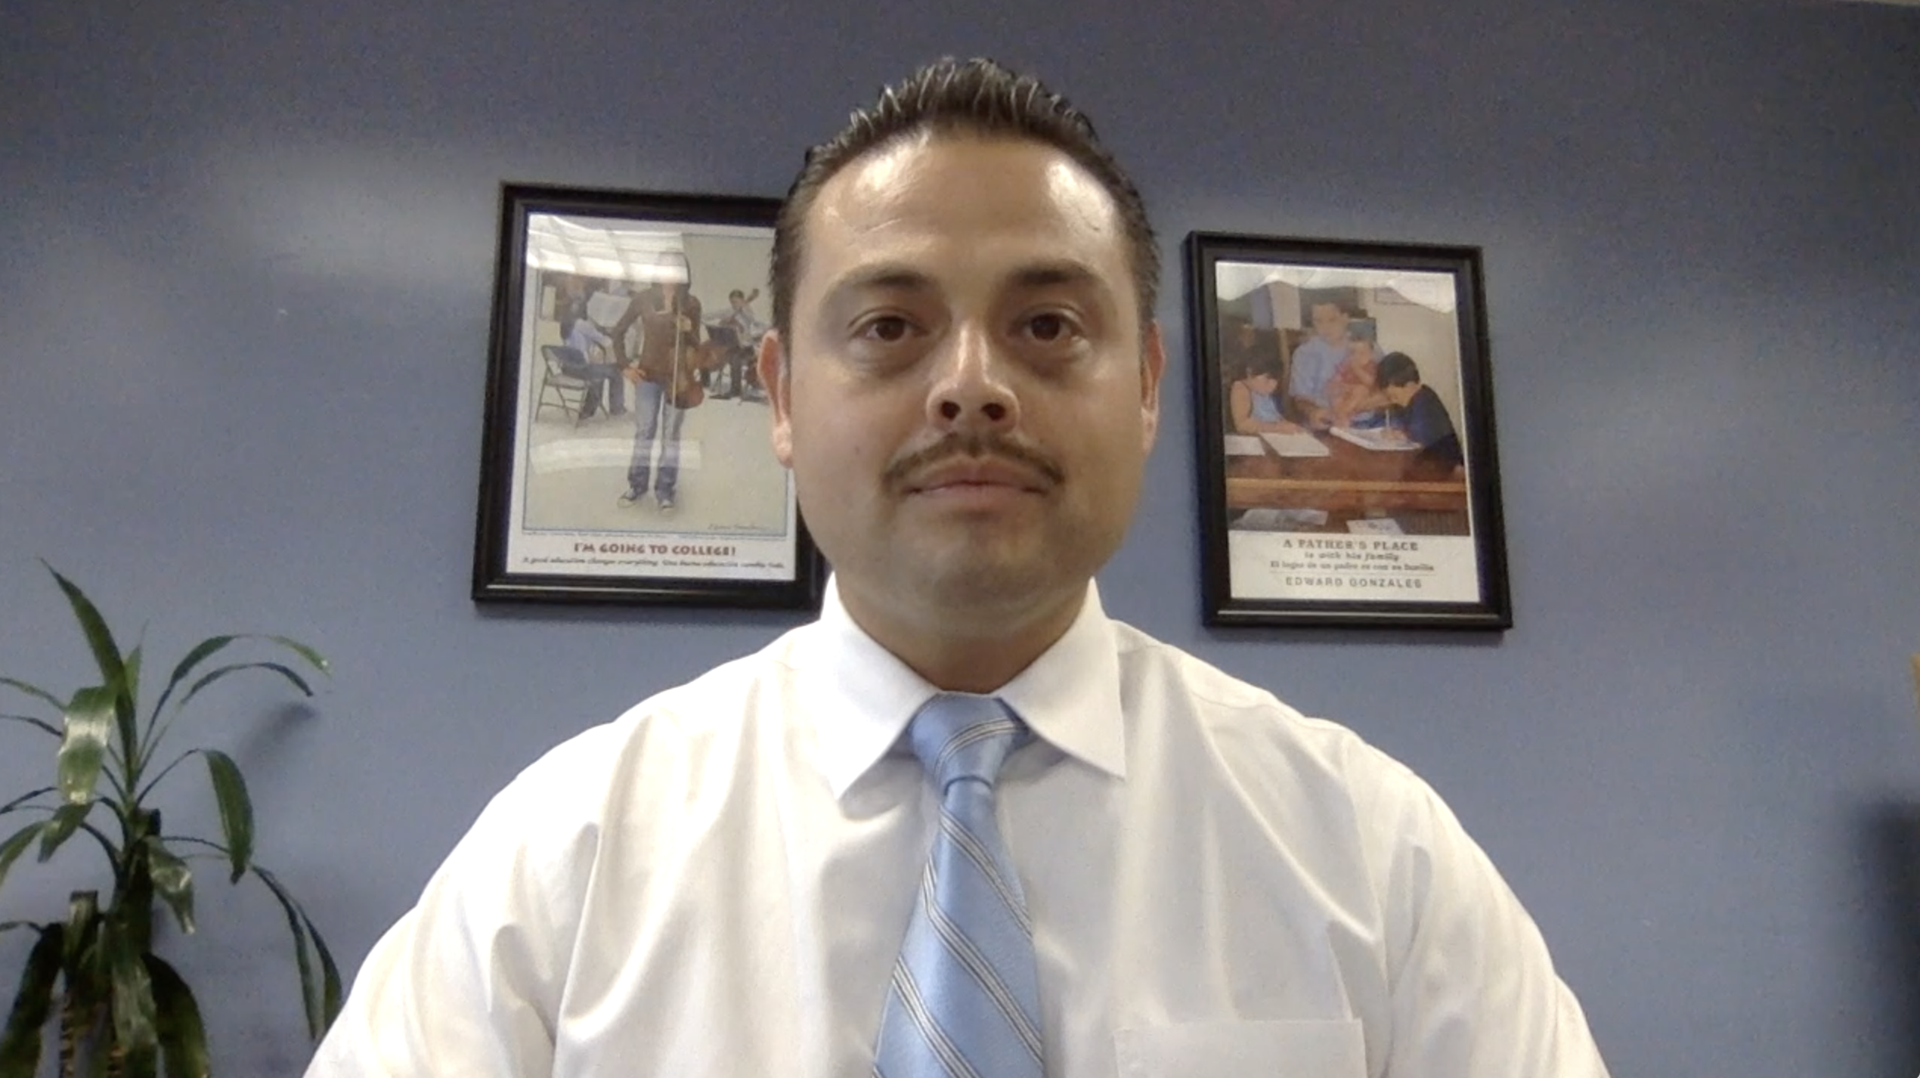 Mr. Gutierrez